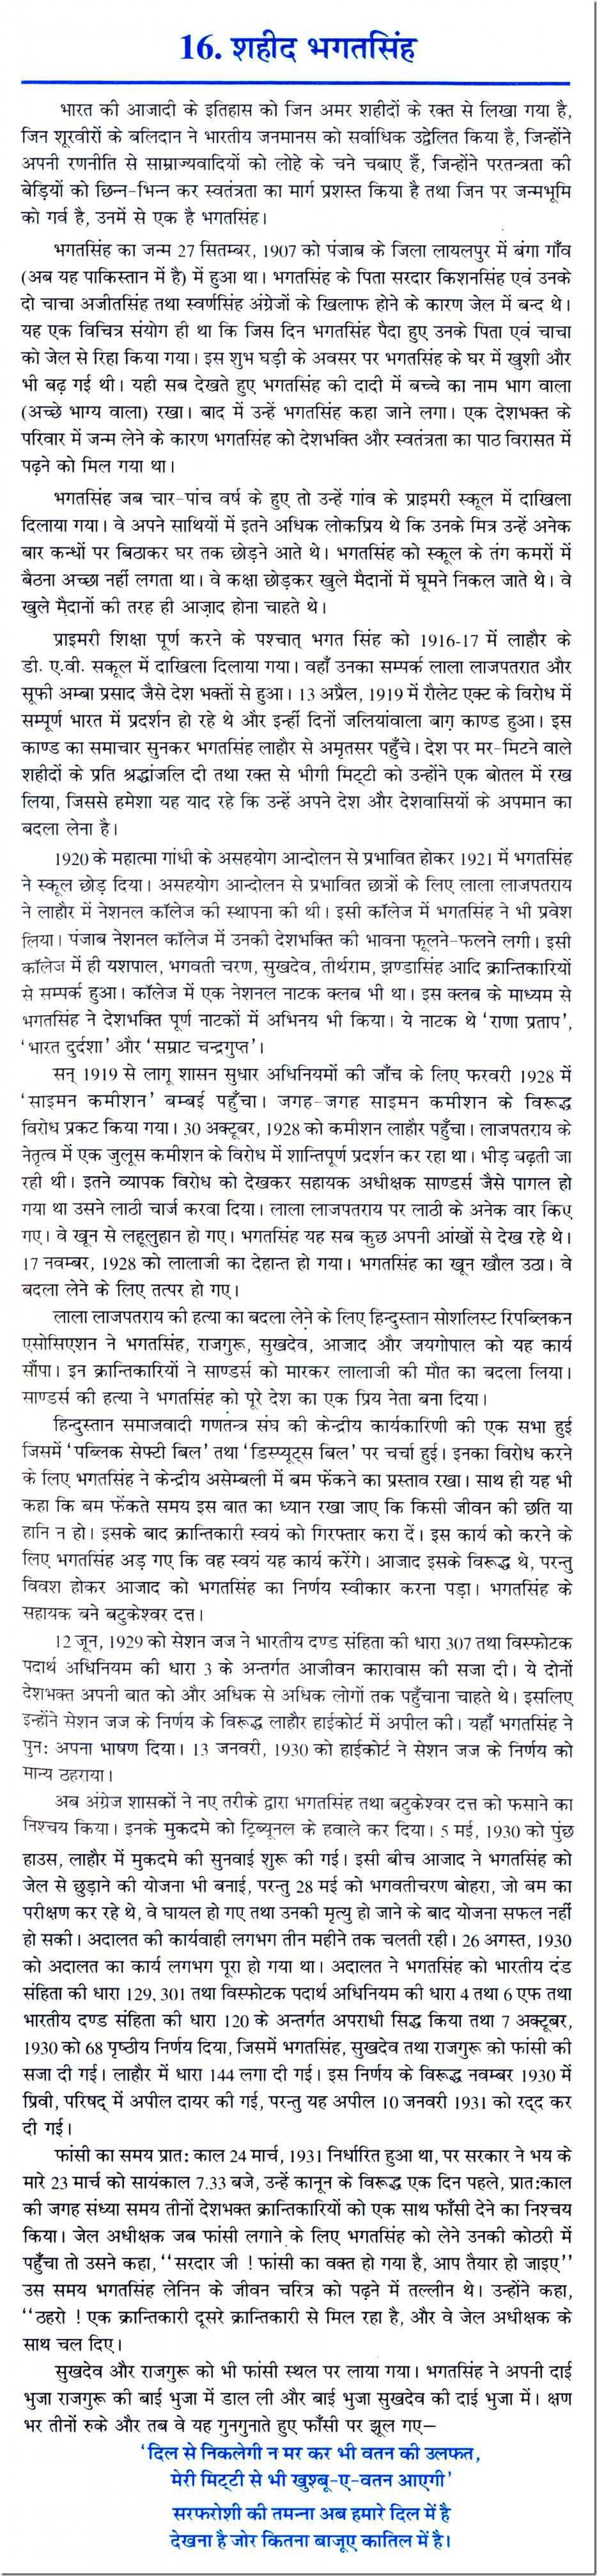 015 0020016 Thumb Essay Example On Bhagat Singh In Unique Marathi Short 100 Words 1920